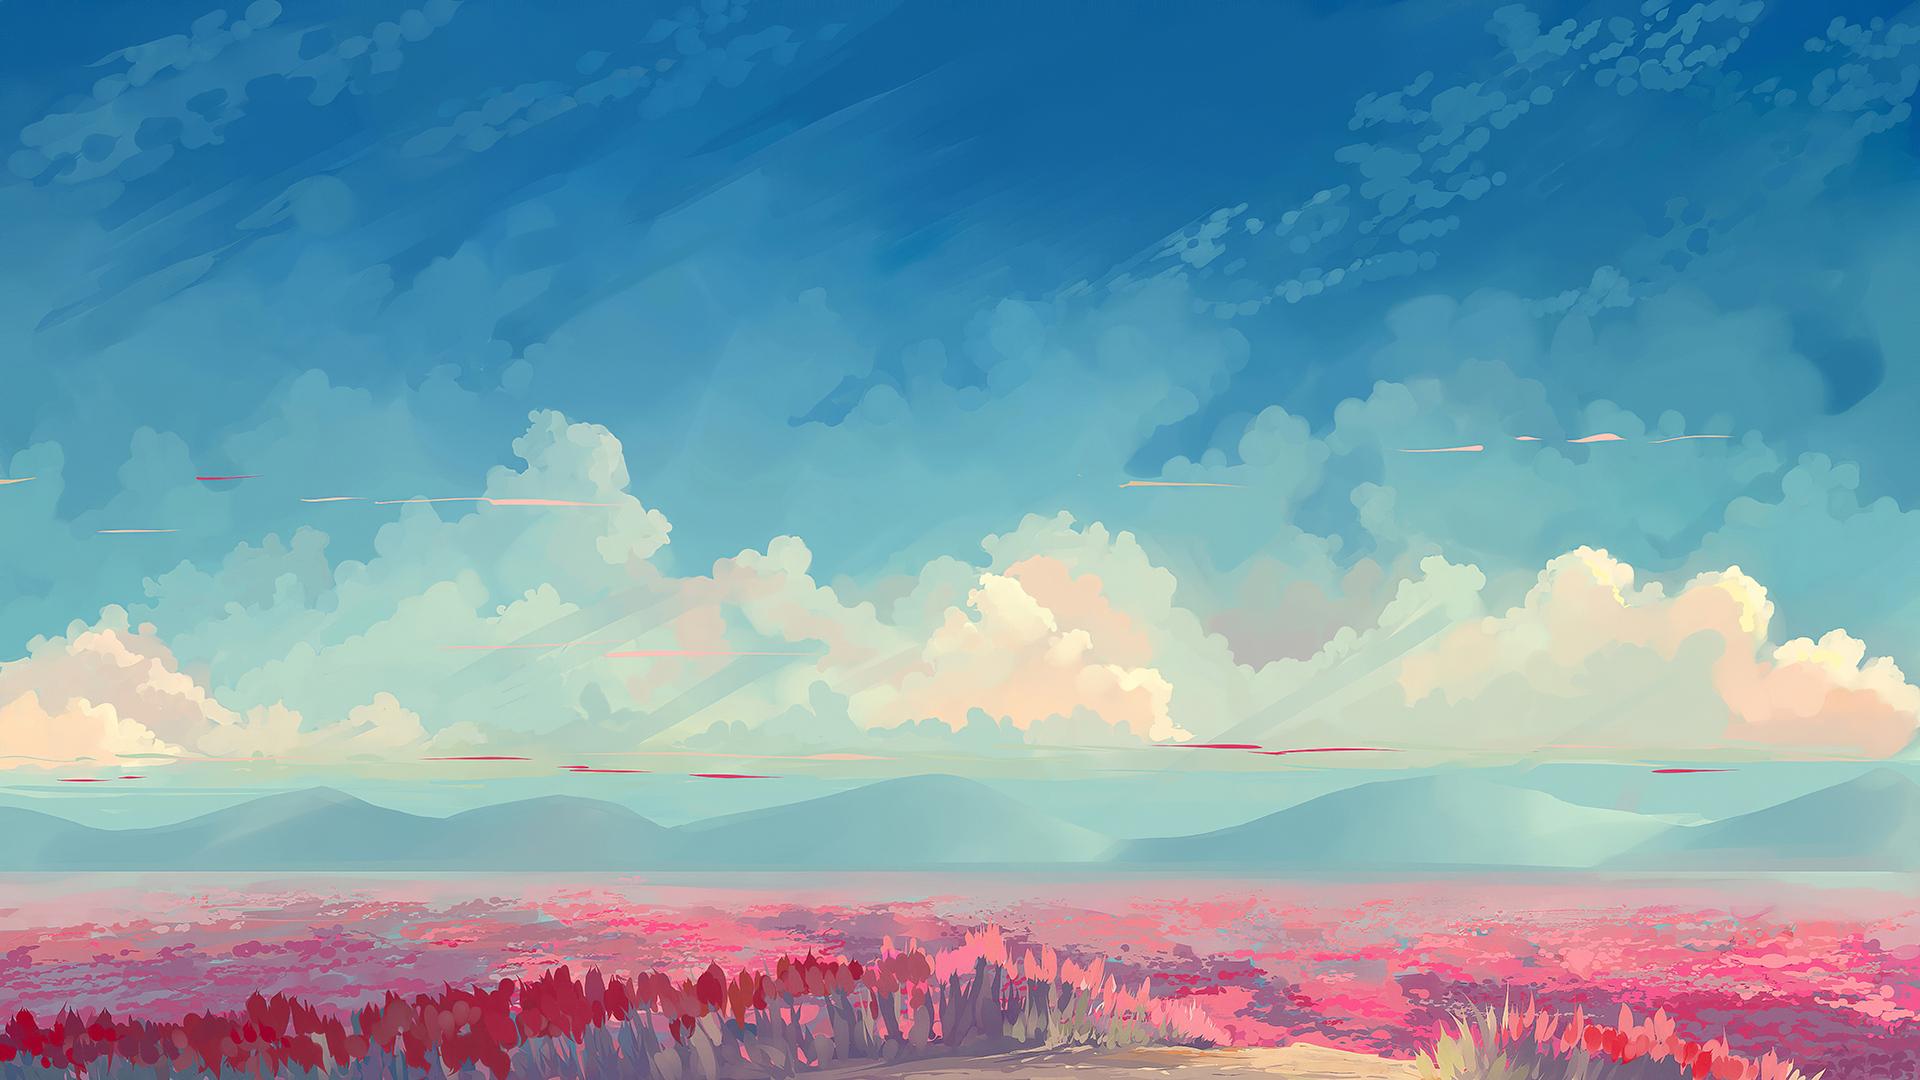 sky blue clouds digital art 4k pc